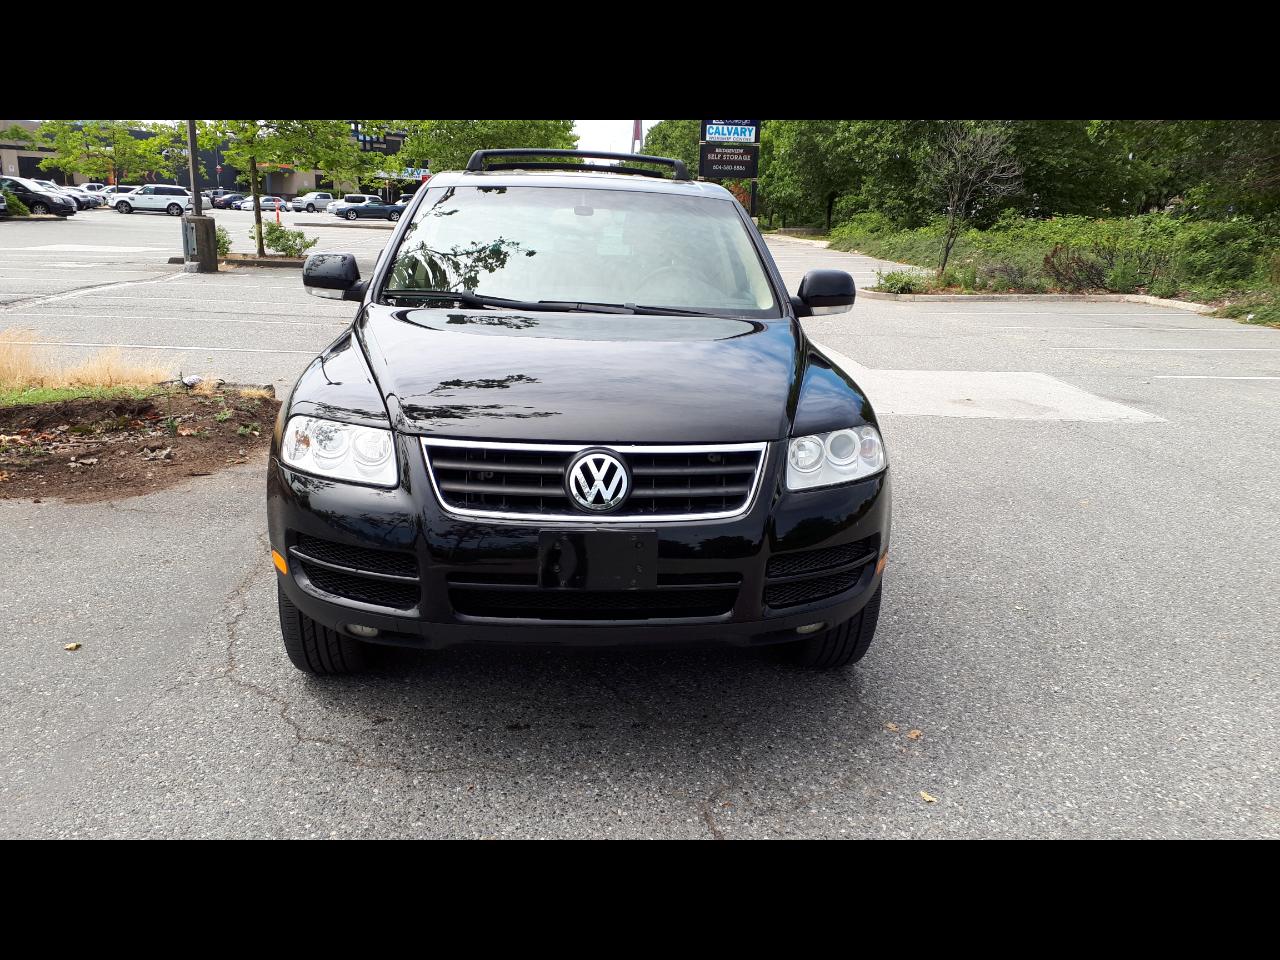 2004 Volkswagen Touareg V6